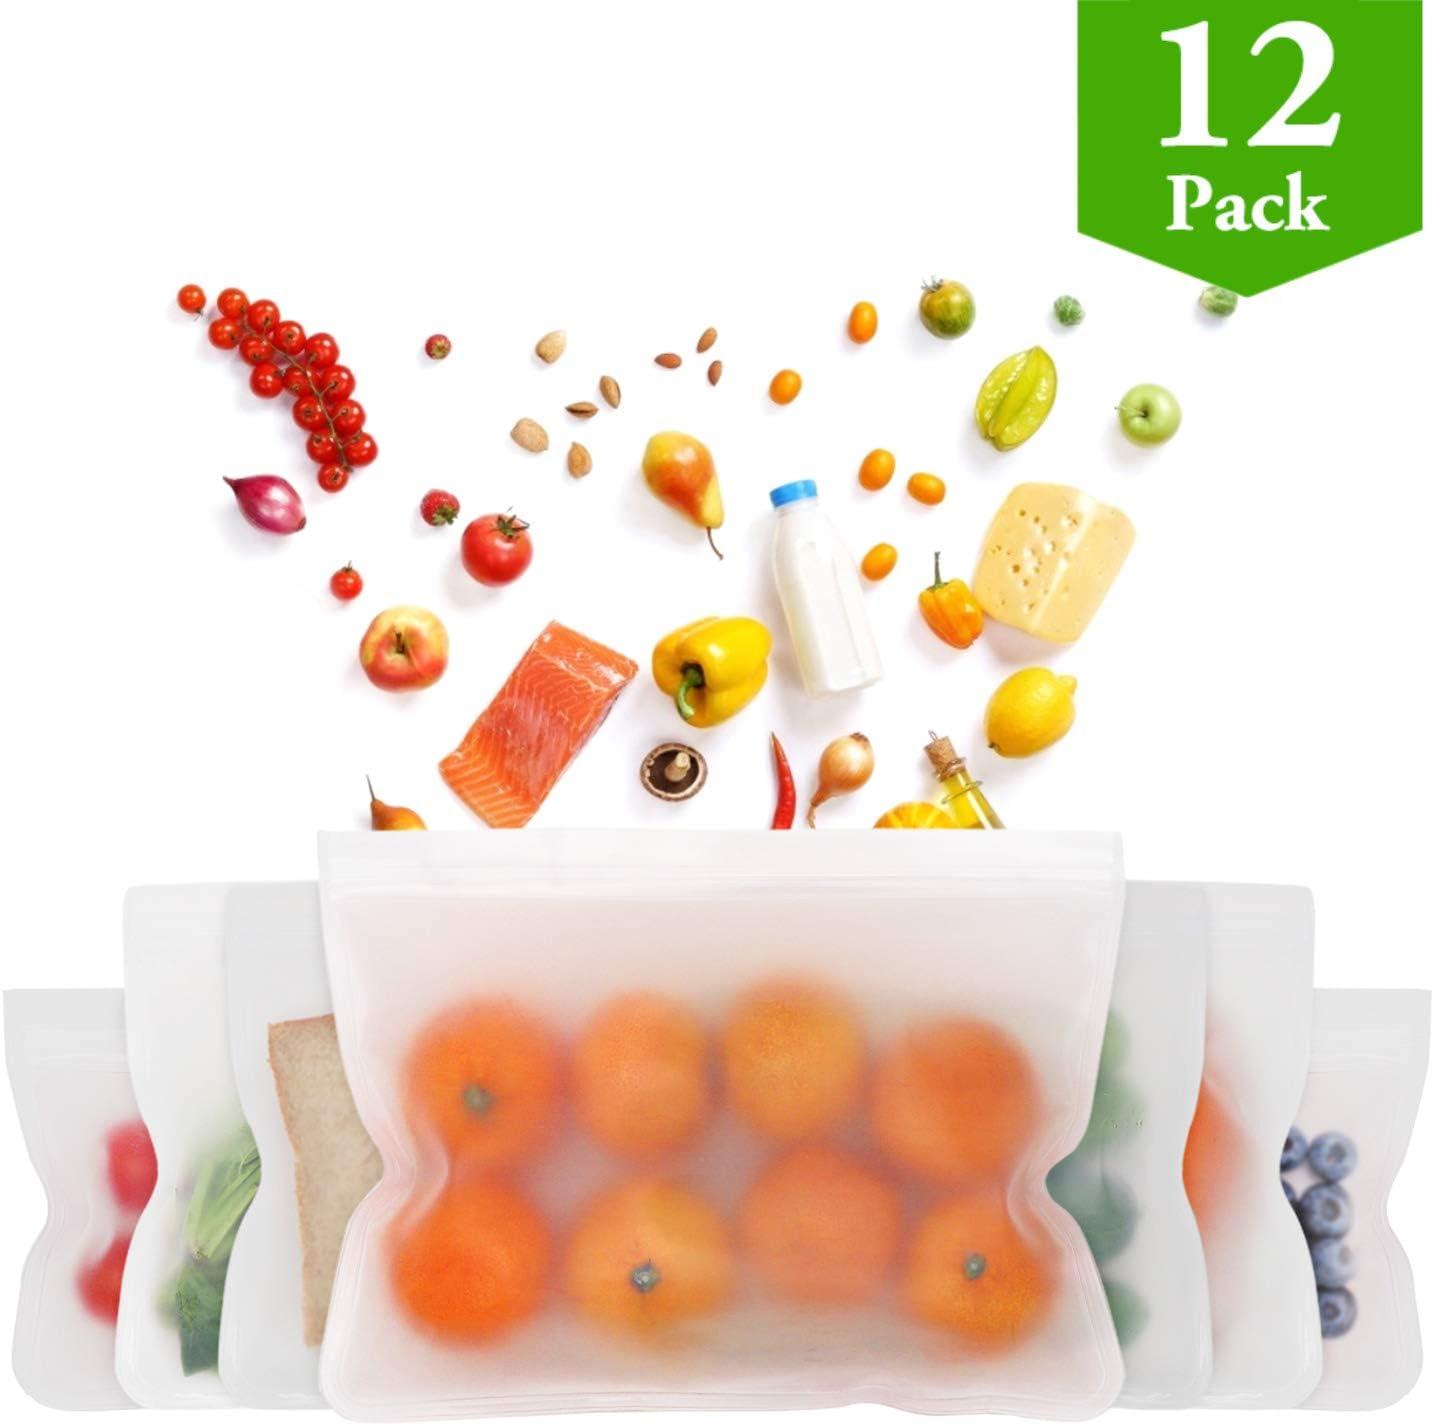 Reusable Storage Bags - 12 Pack BPA FREE Freezer Bags(4 Reusable Gallon Bags, 4 Reusable Sandwich Bags, 4 Reusable Snack Bags), Leakproof Ziplock Lunch Bags for Food Storage Travel Home Organization